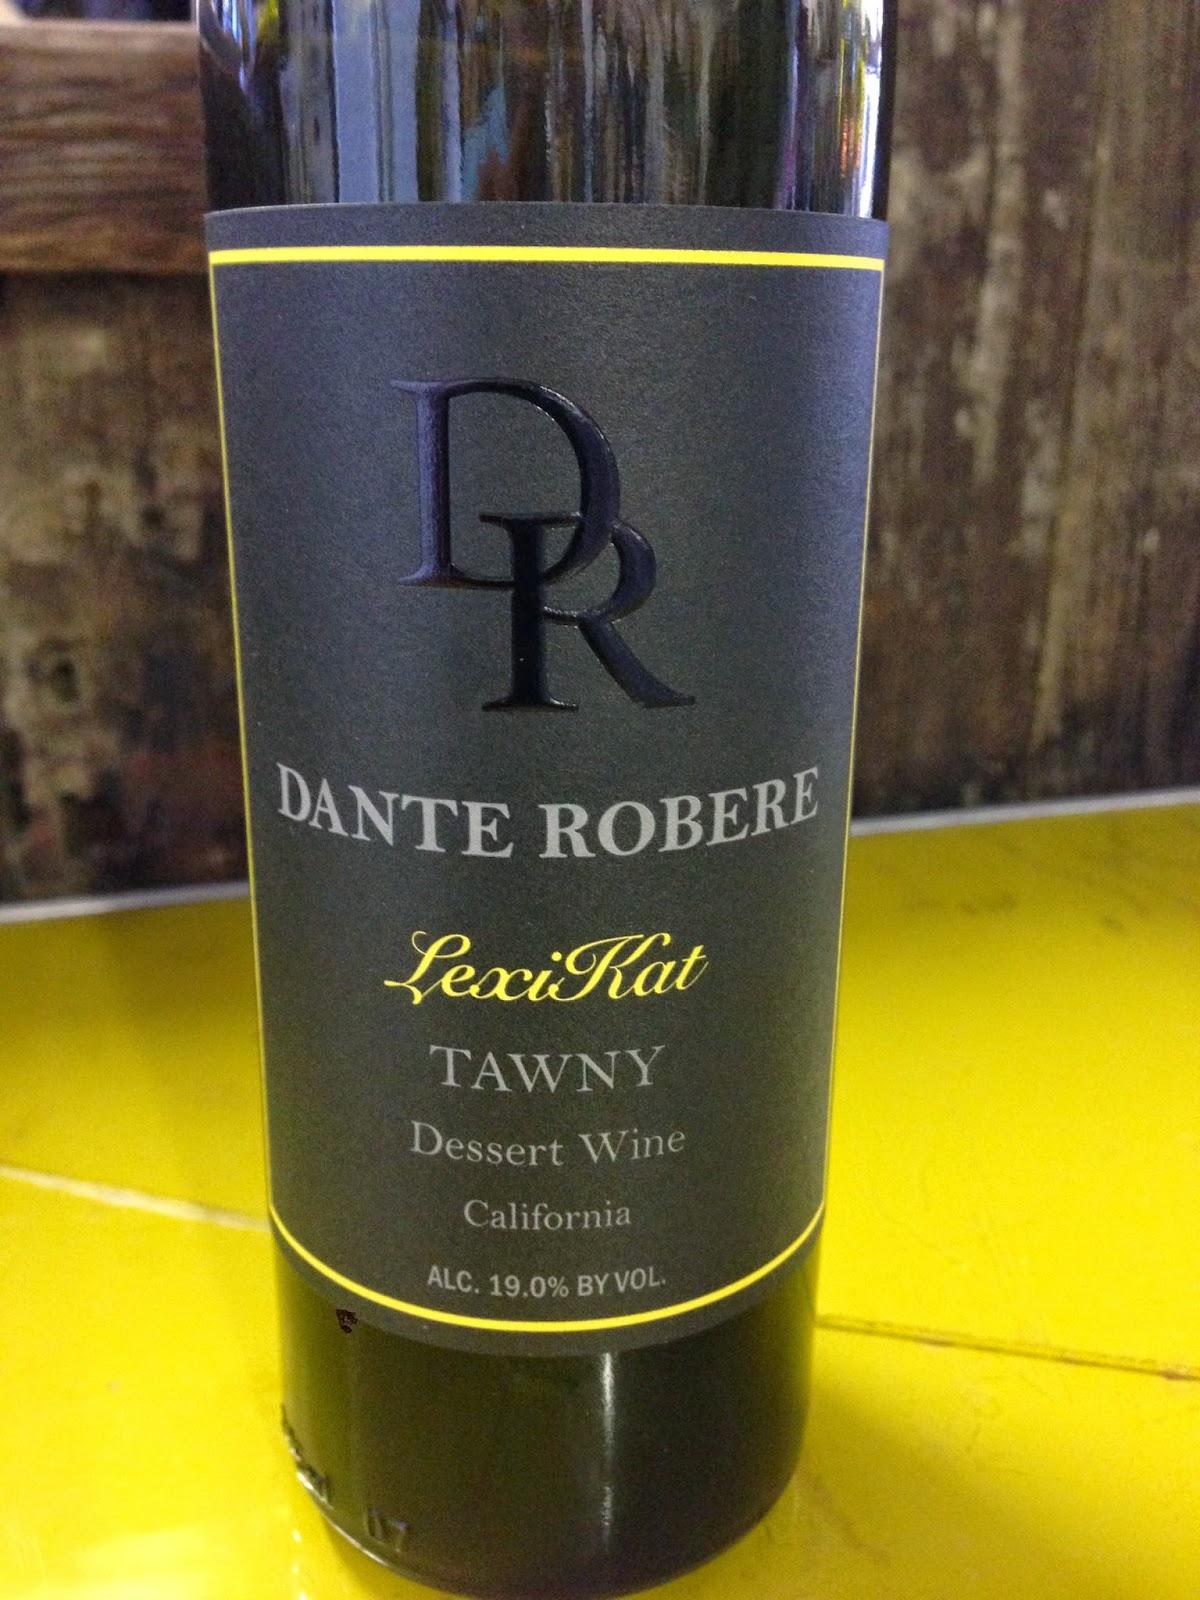 Dante Robere Vineyards: An Update